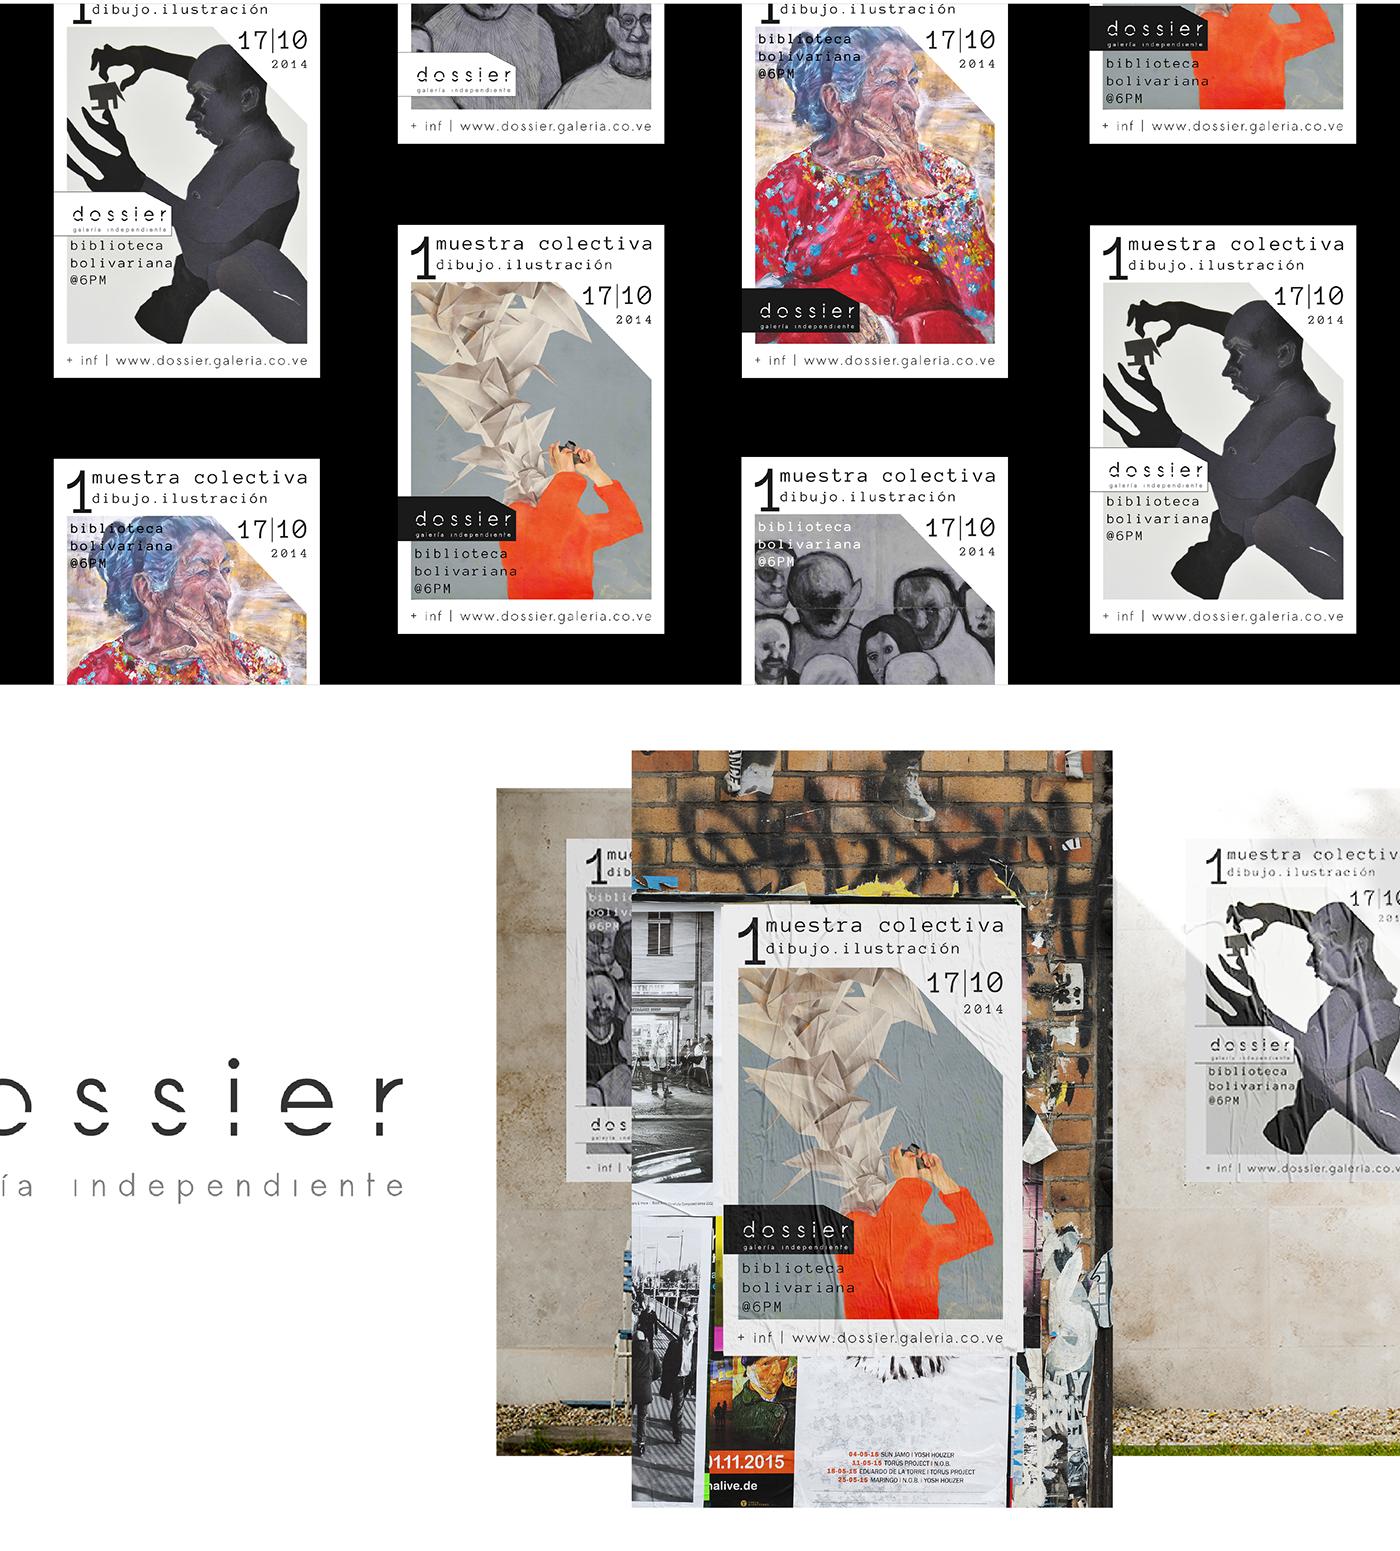 museum gallery artist Exhibition  ILLUSTRATION  design